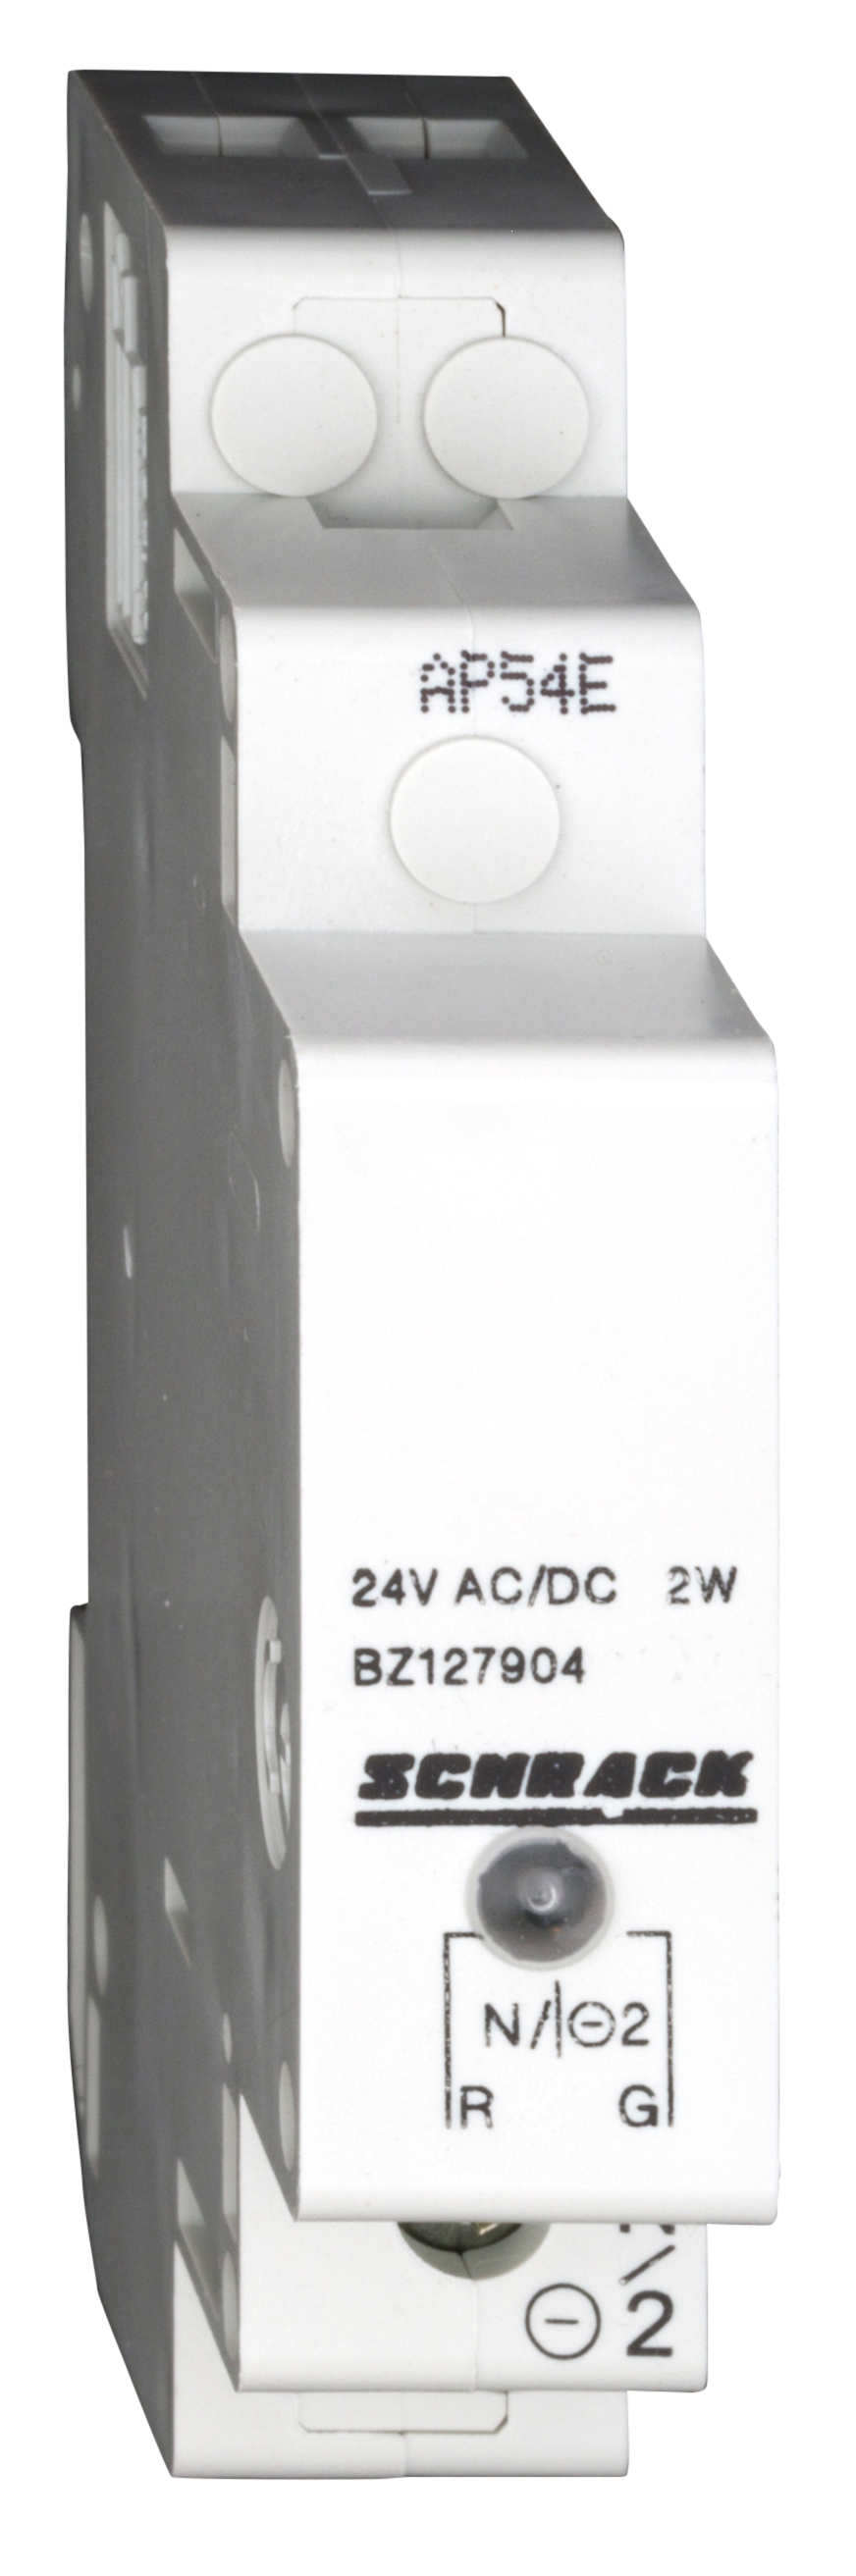 1 Stk Reiheneinbau-Einzelleuchte LED 12-24VAC/DC, rot/grün BZ127904--